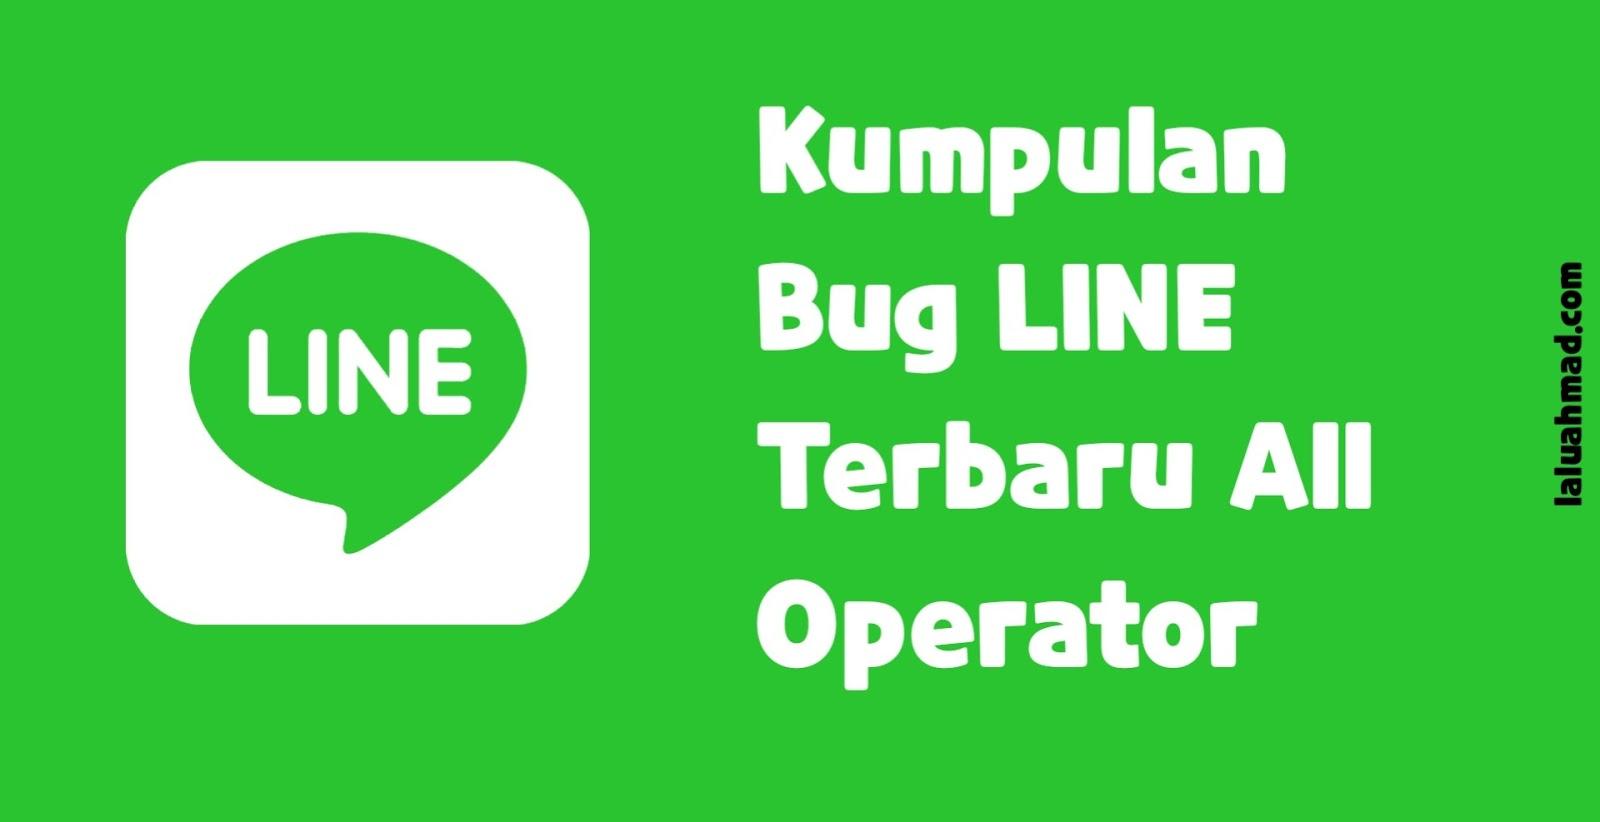 Kumpulan Bug LINE Terbaru All Operator